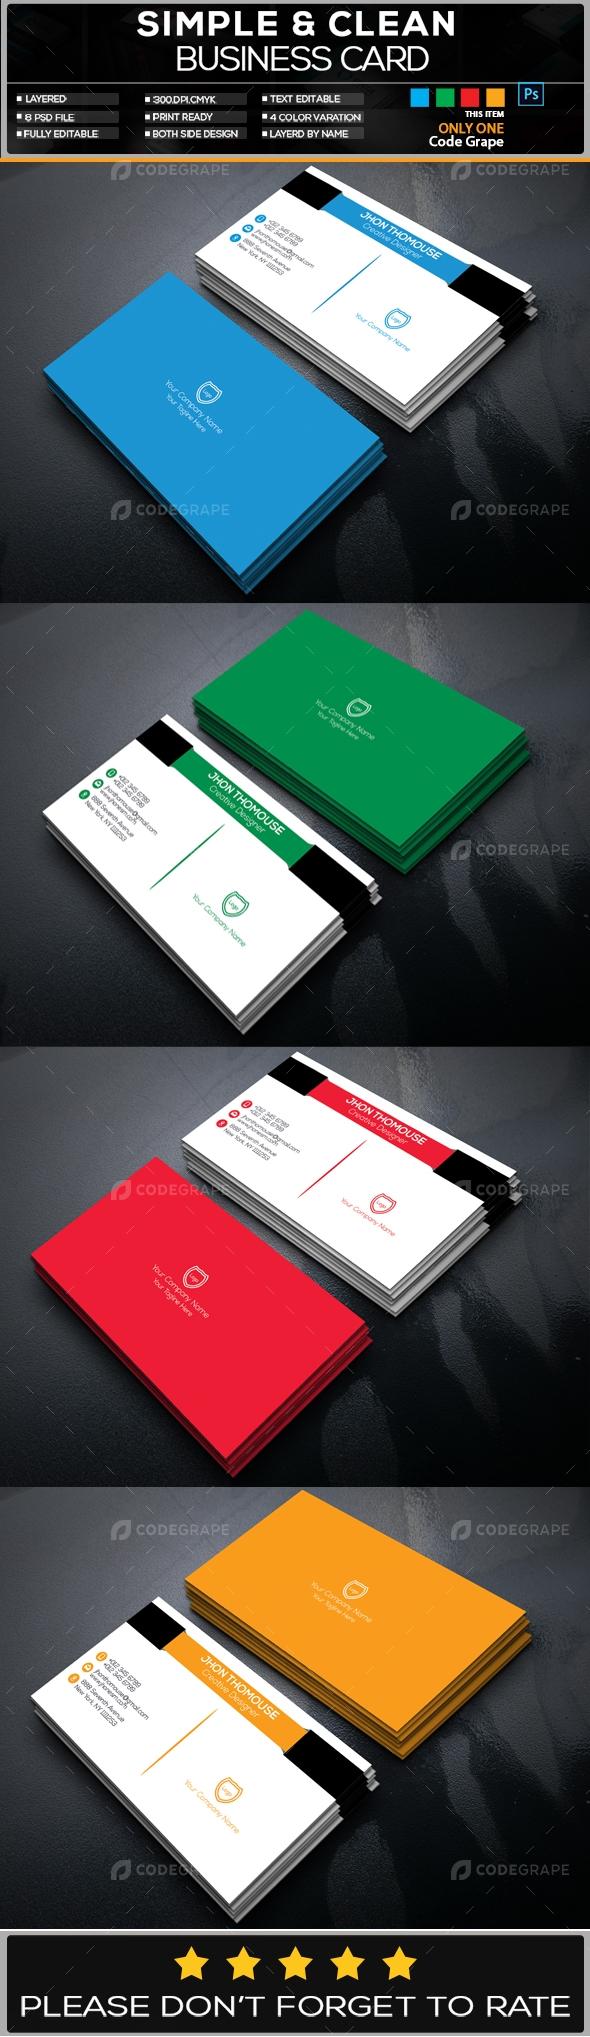 Business Card Vol - 3